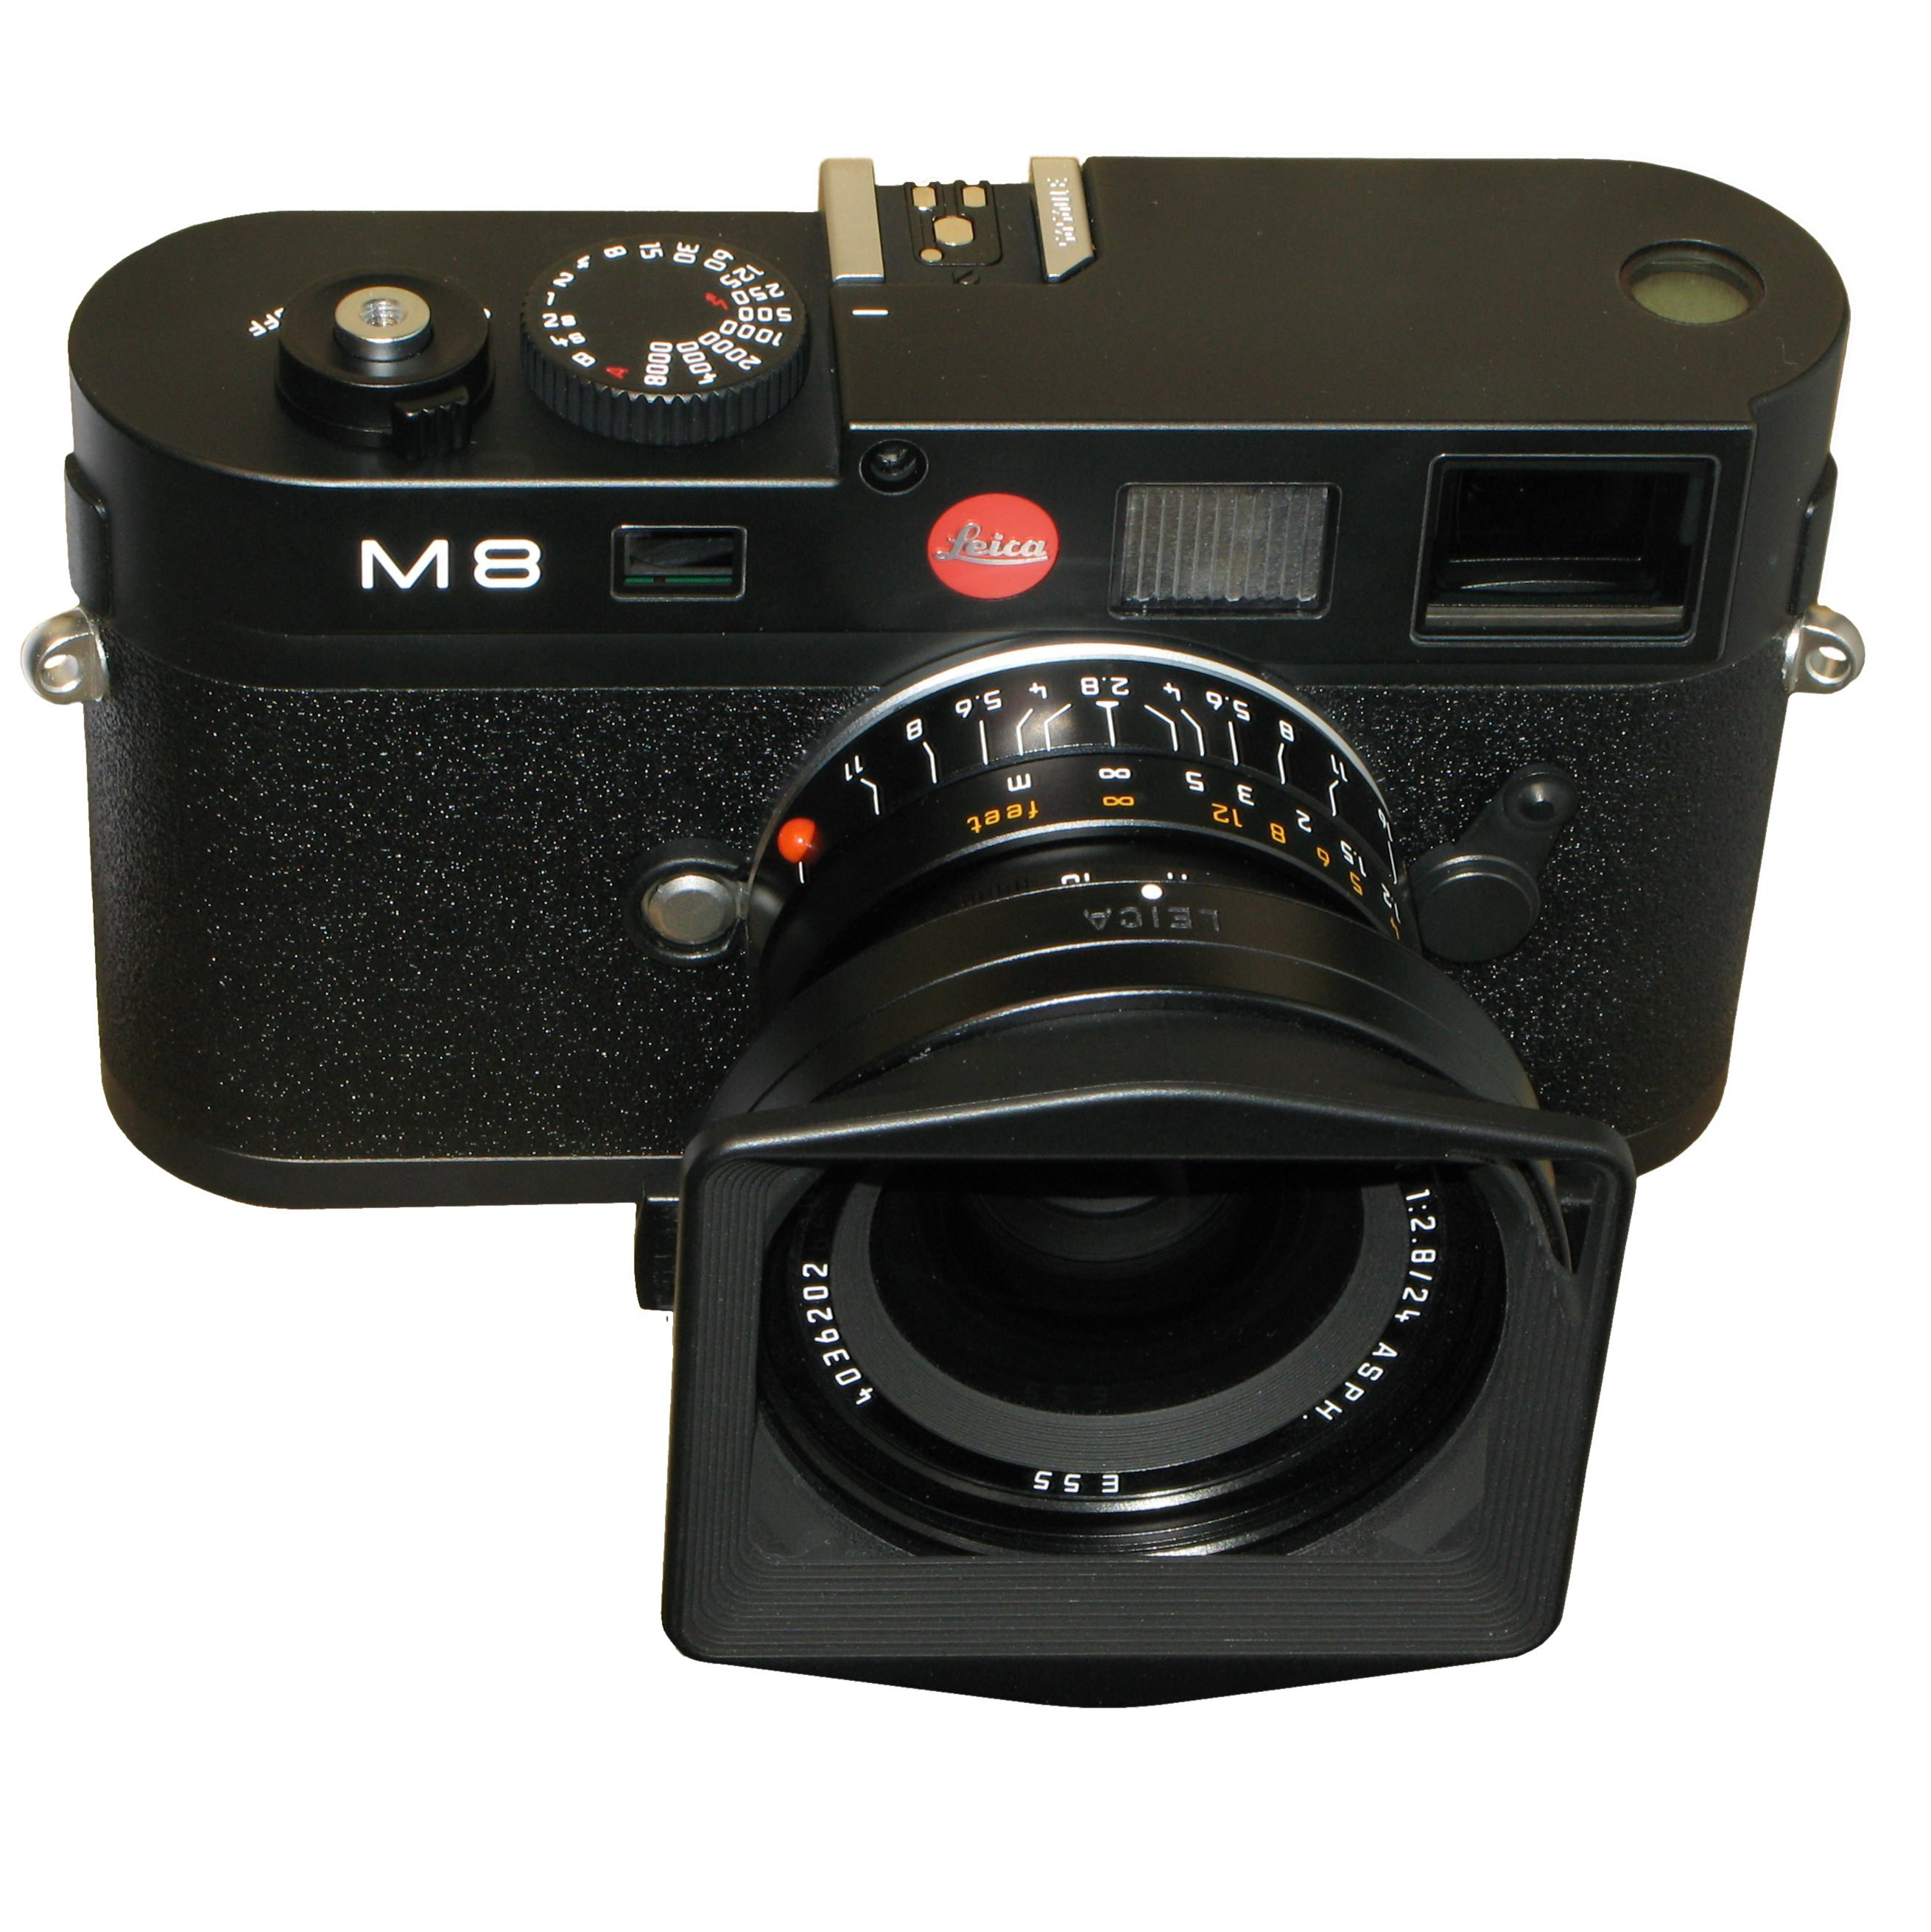 Leica M8 - Wikipedia